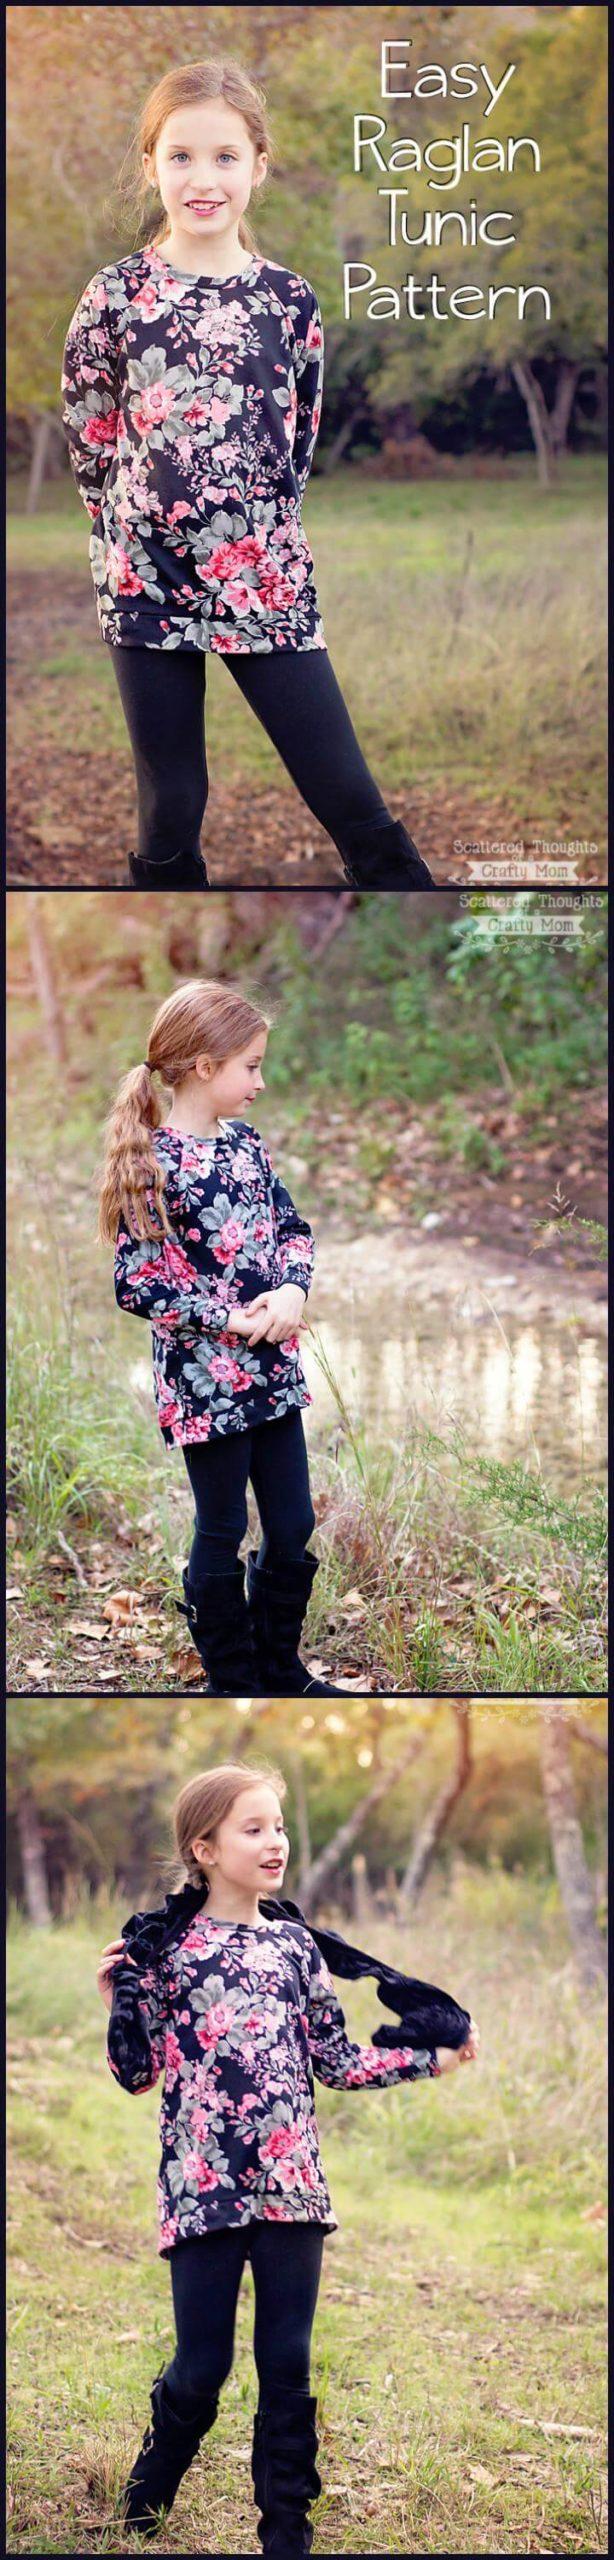 patrón de túnica raglán fácil para niñas